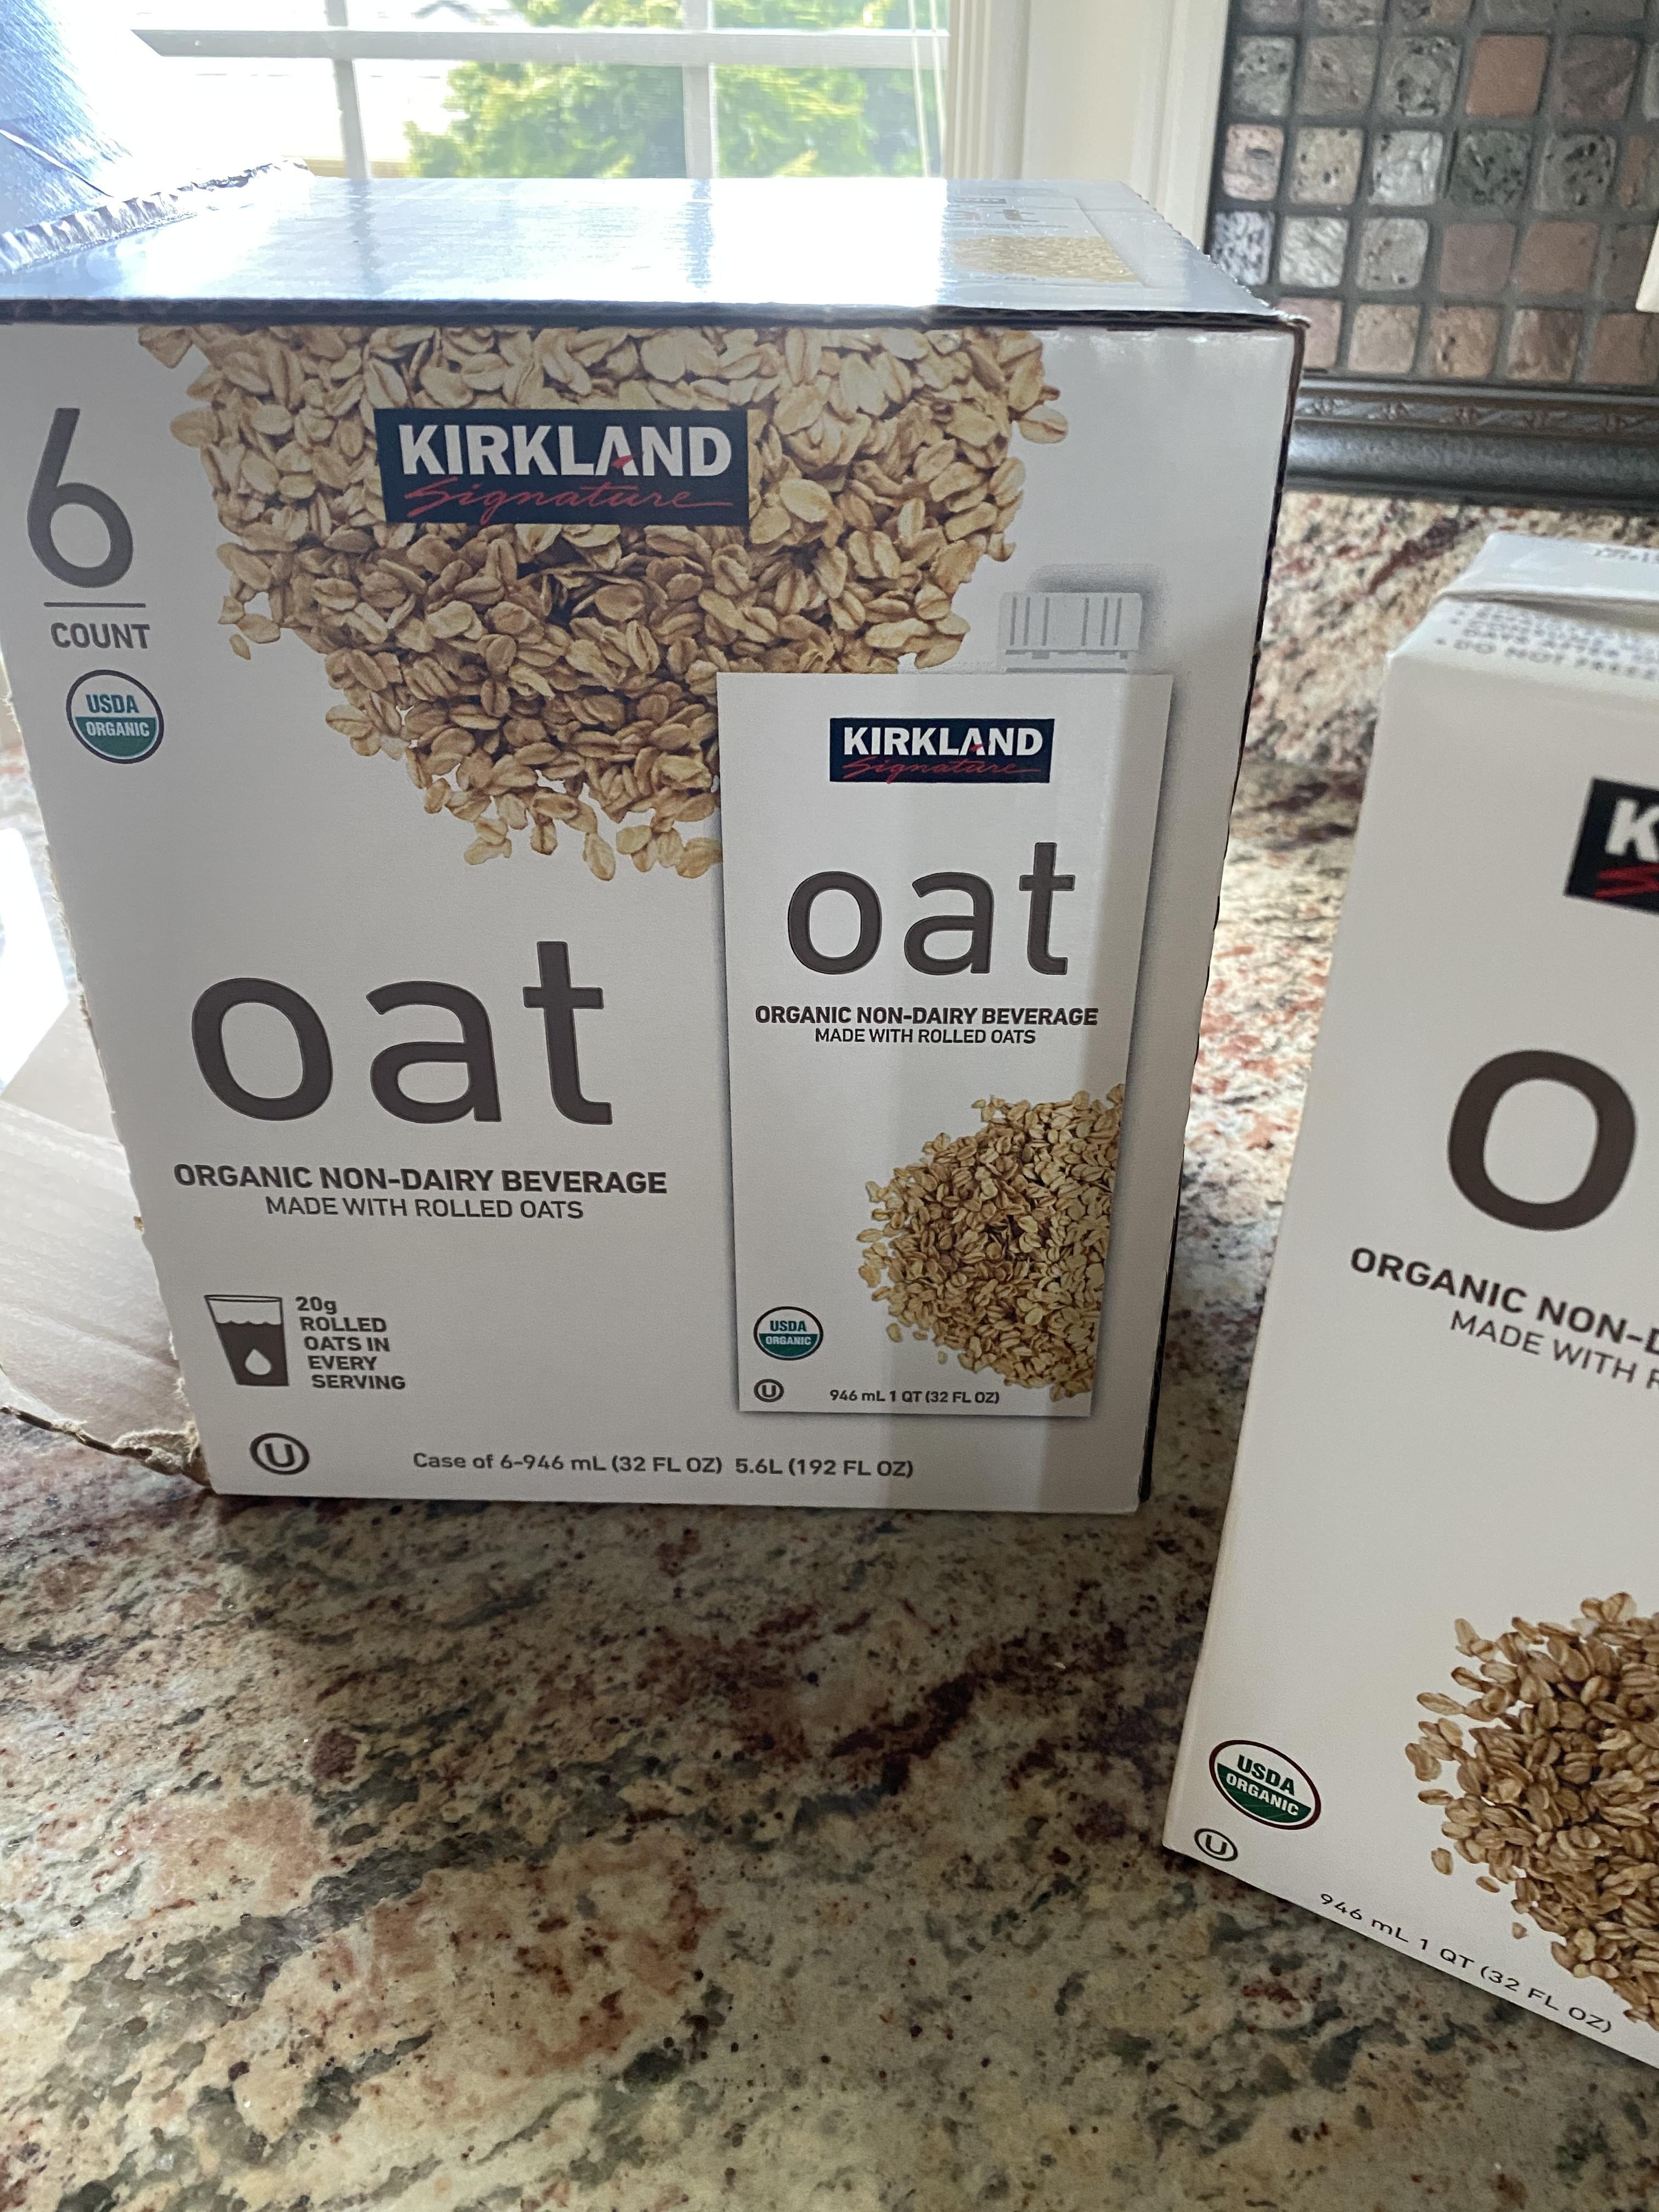 Sữa Oat  F2c99bd501c62c7ce5d5340239e19b73